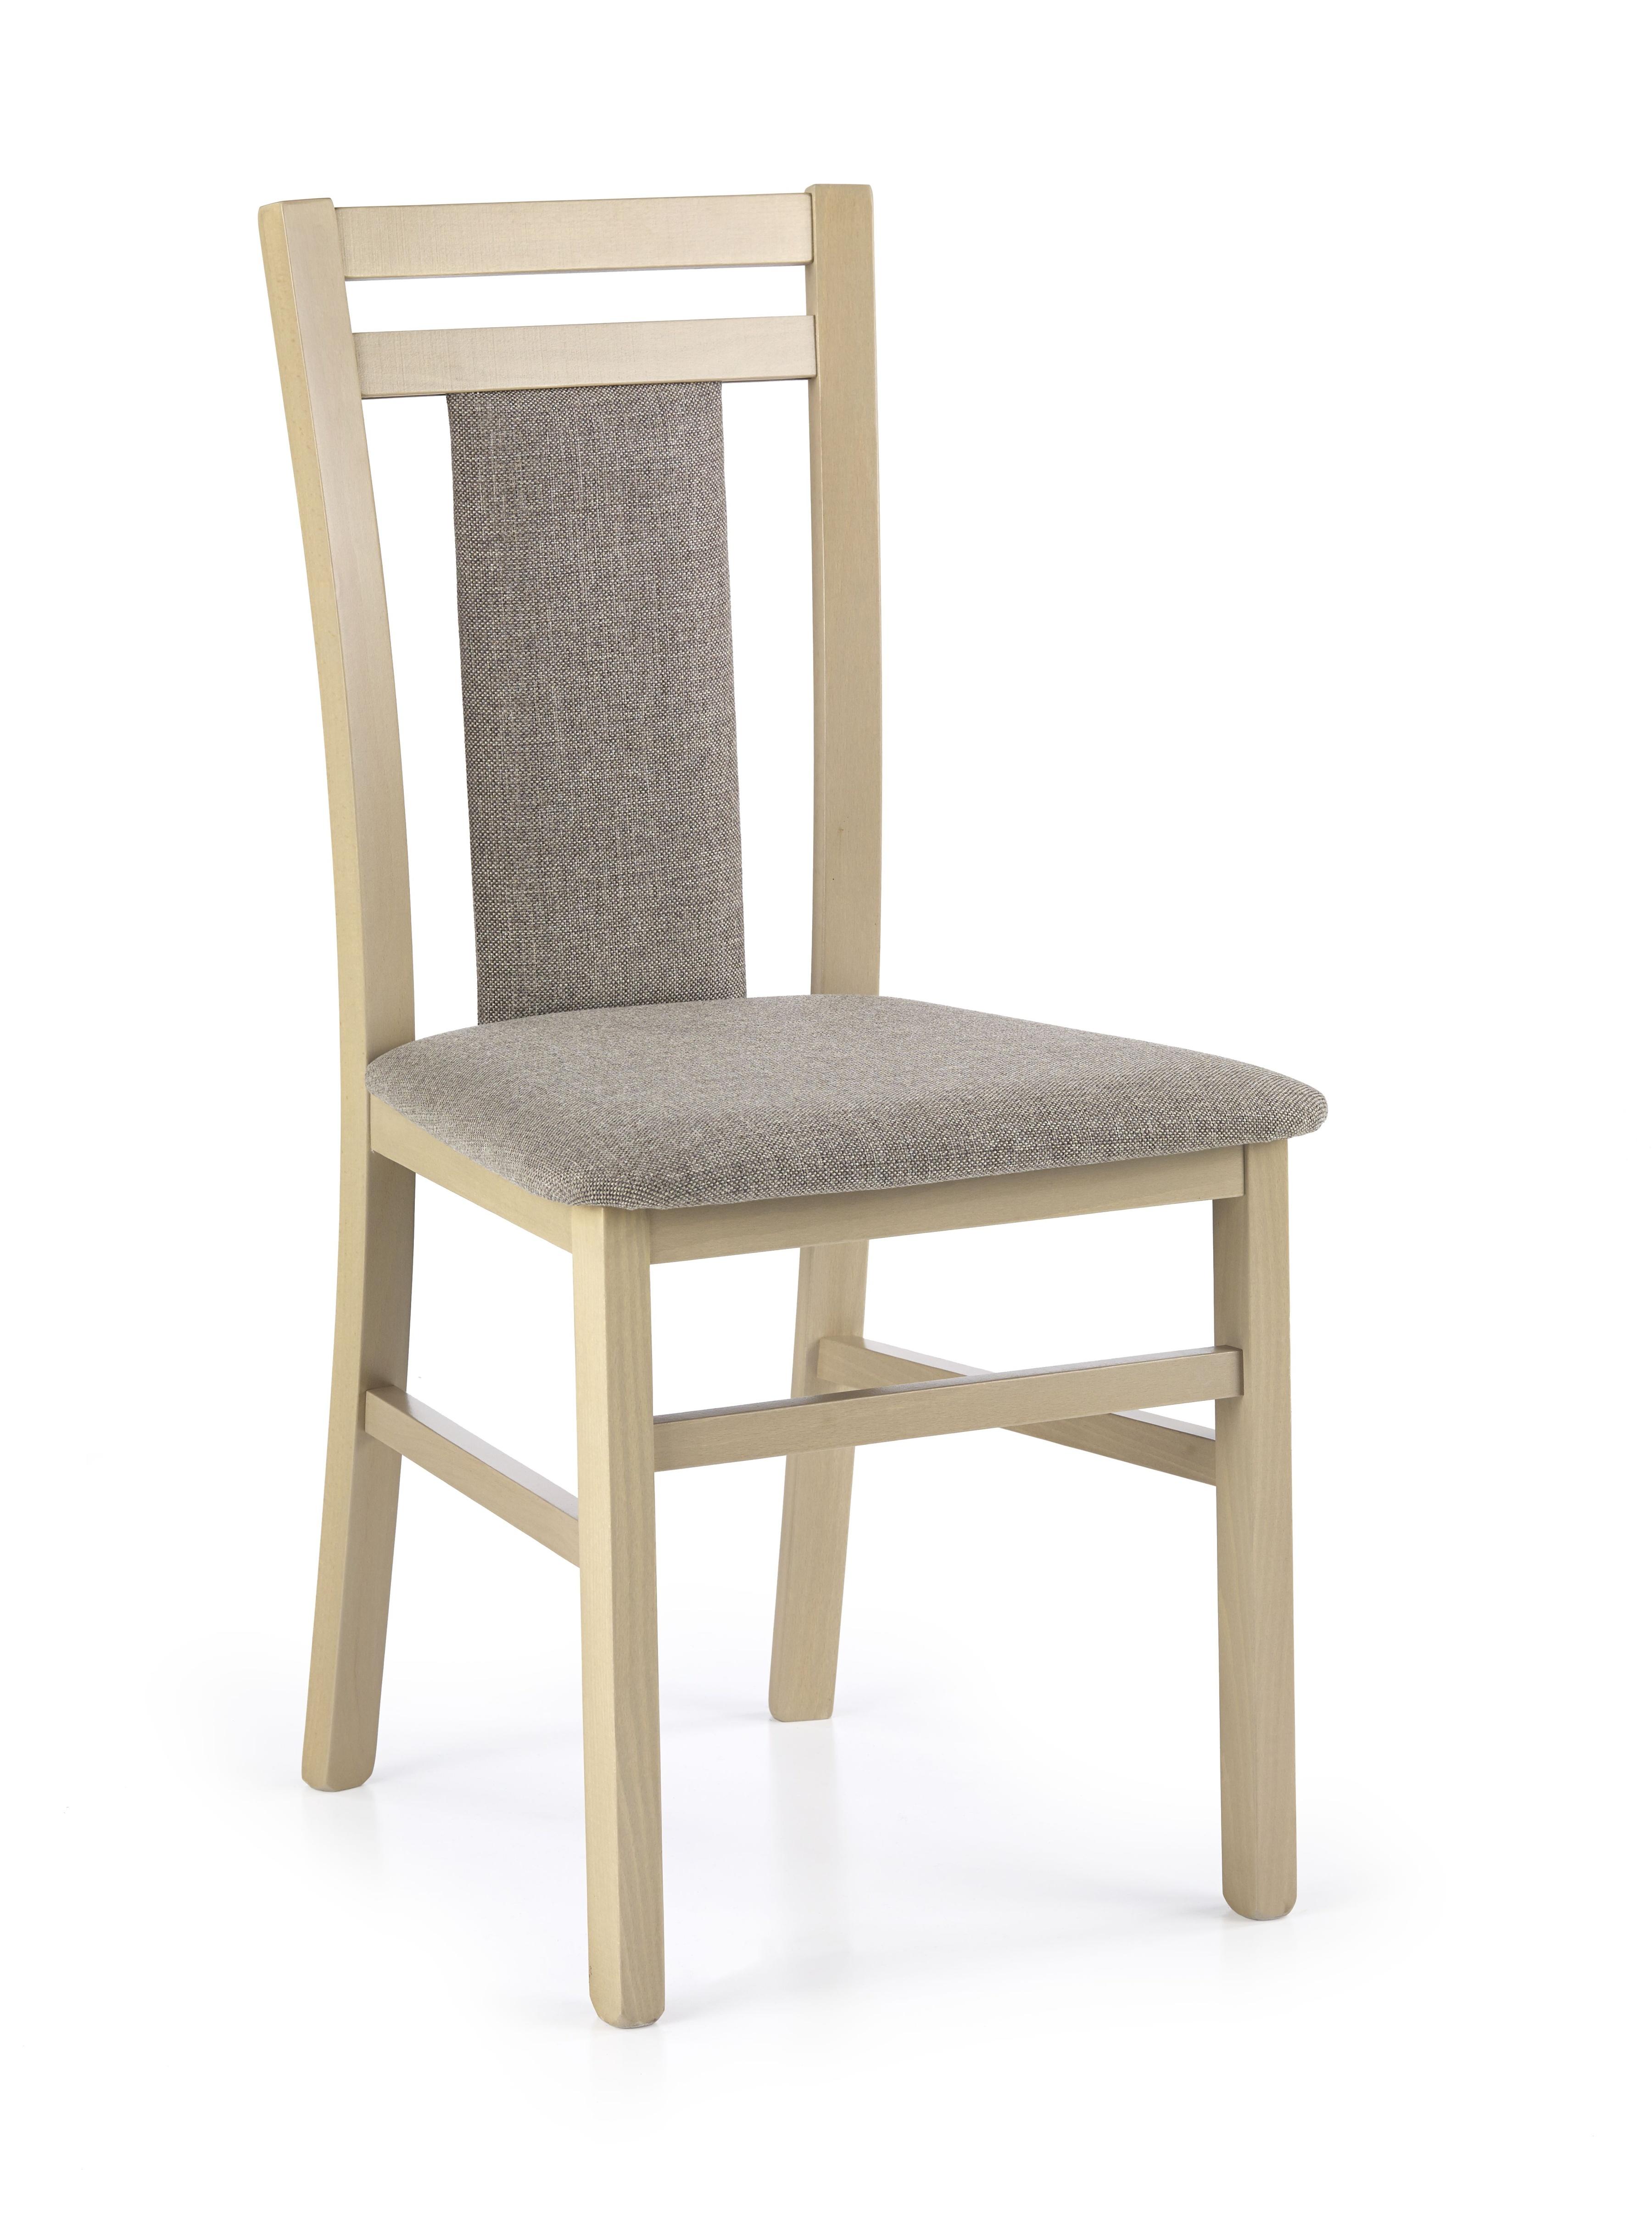 Jedálenská stolička - Halmar - HUBERT 8 Dub Sonoma